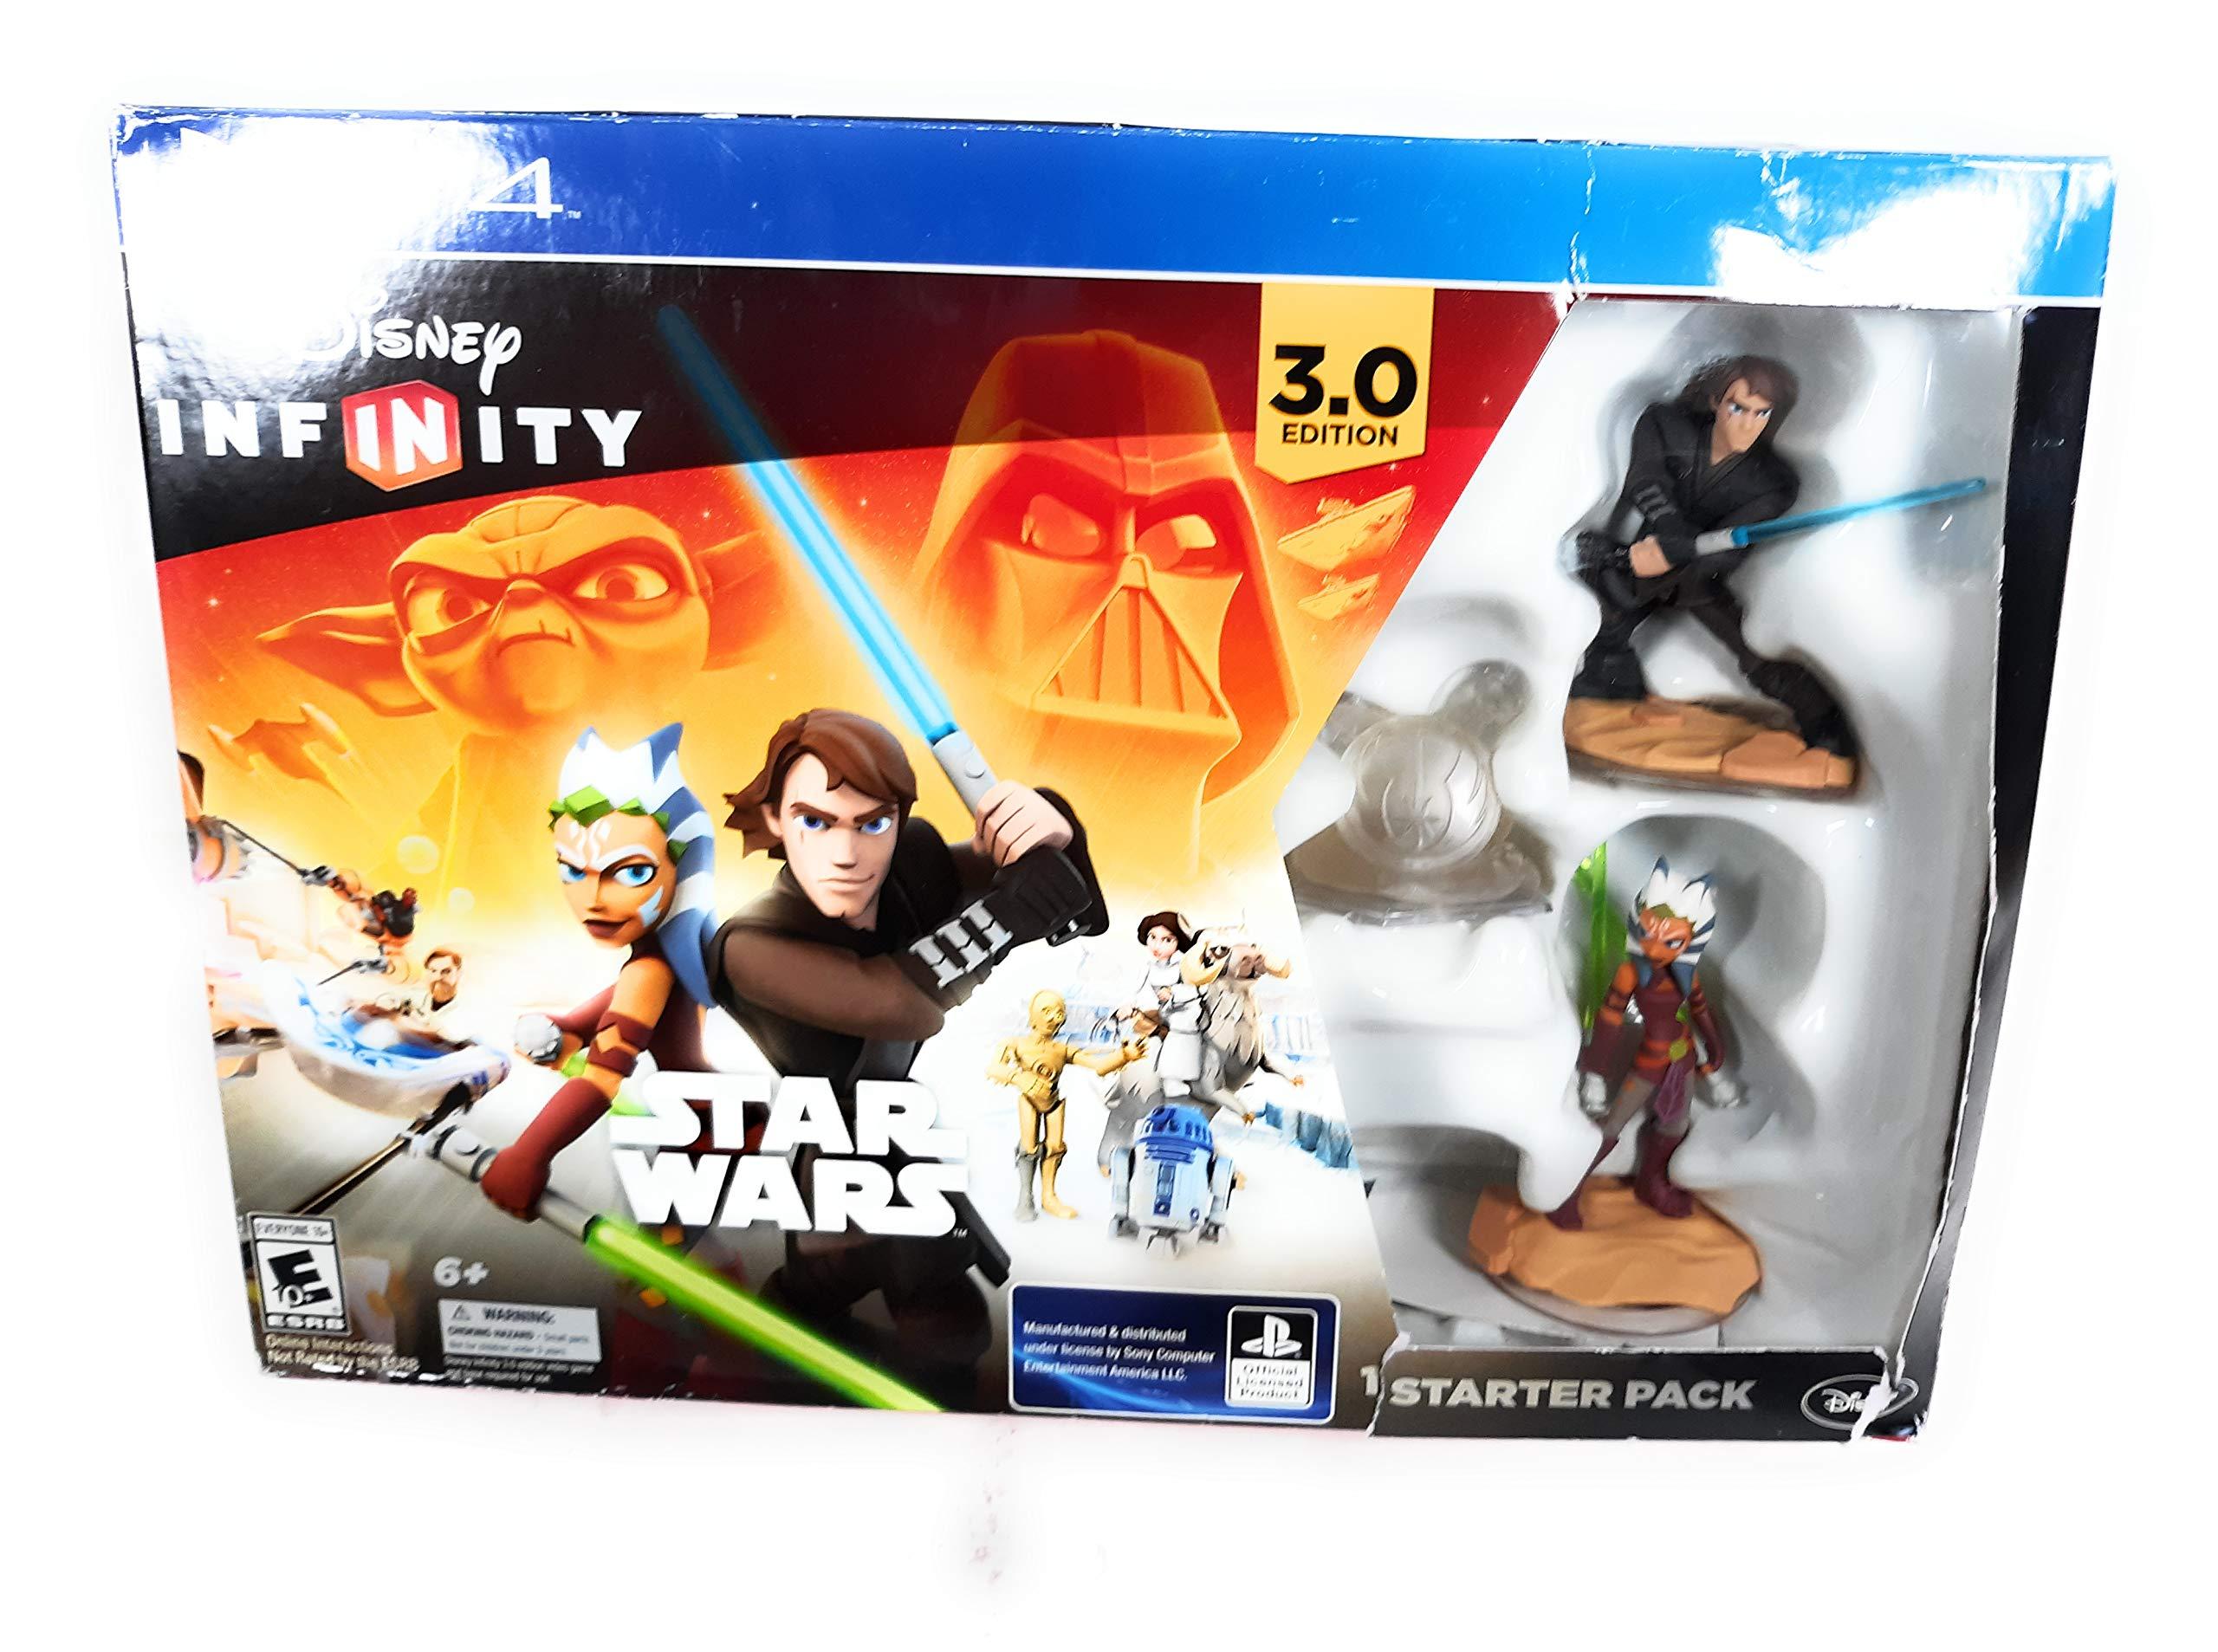 Disney Infinity 3.0 Edition Star Wars Ps4 Playstation 4 Starter Pack sellado